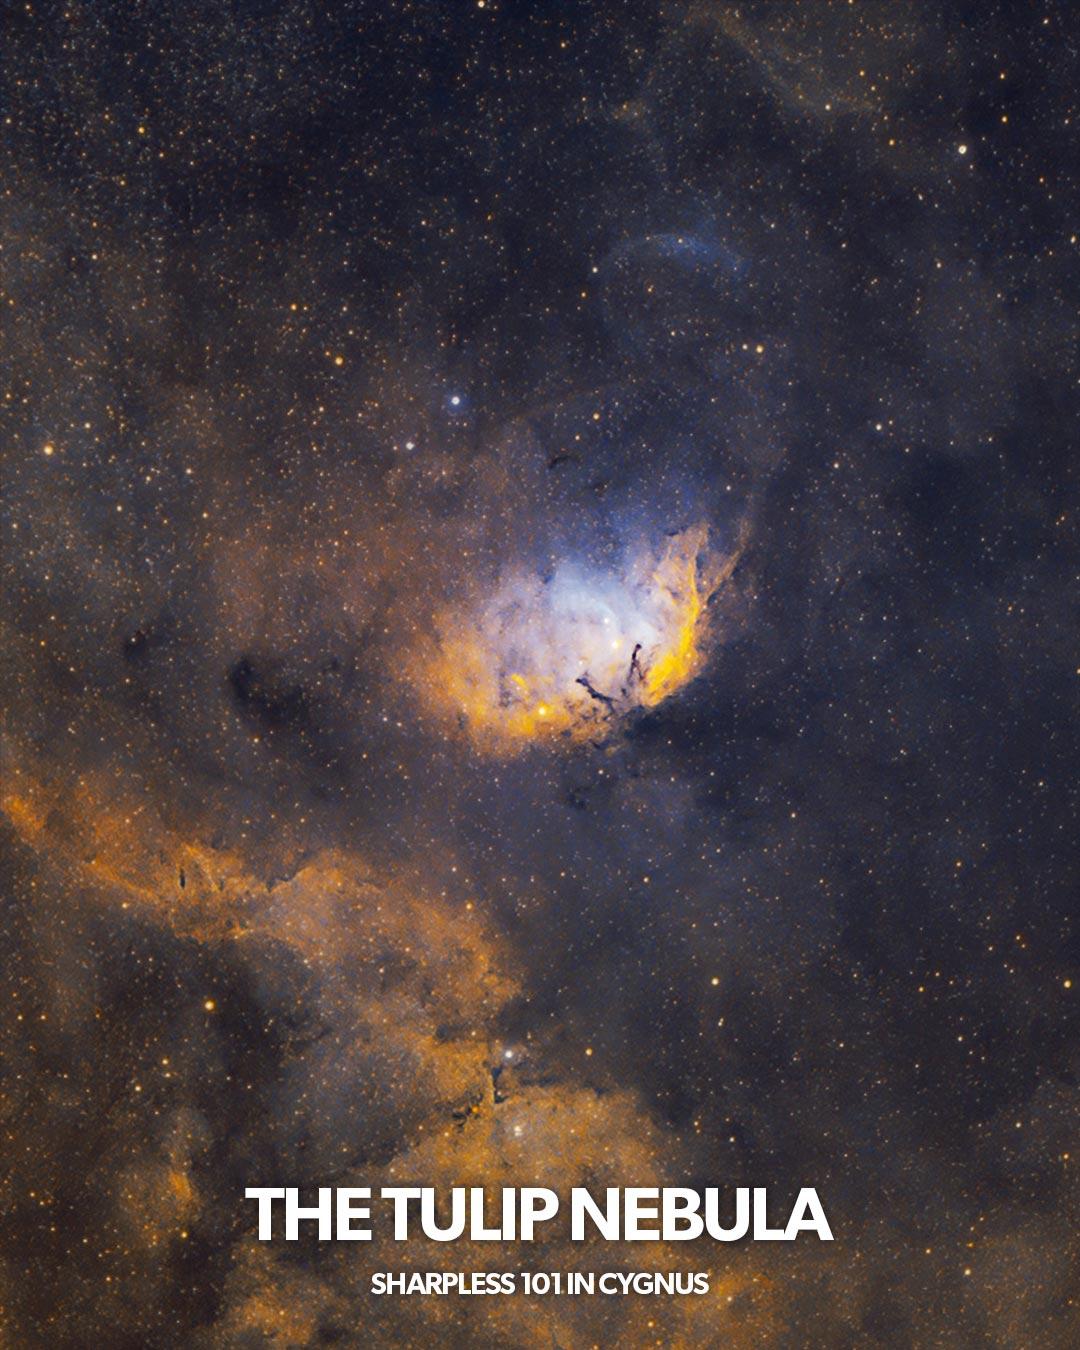 The Tulip Nebula in Space